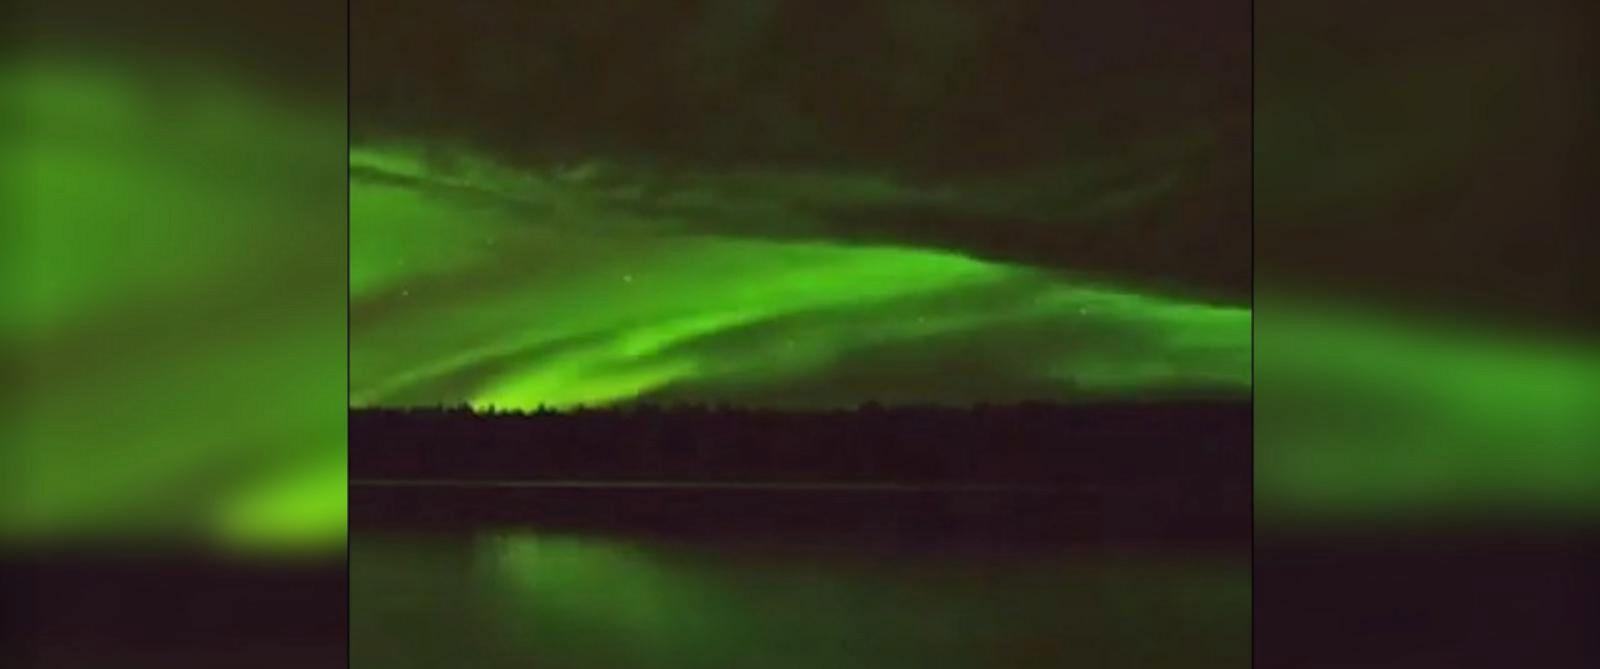 VIDEO: Footage was captured at Glacier Bay National Park and Preserve.